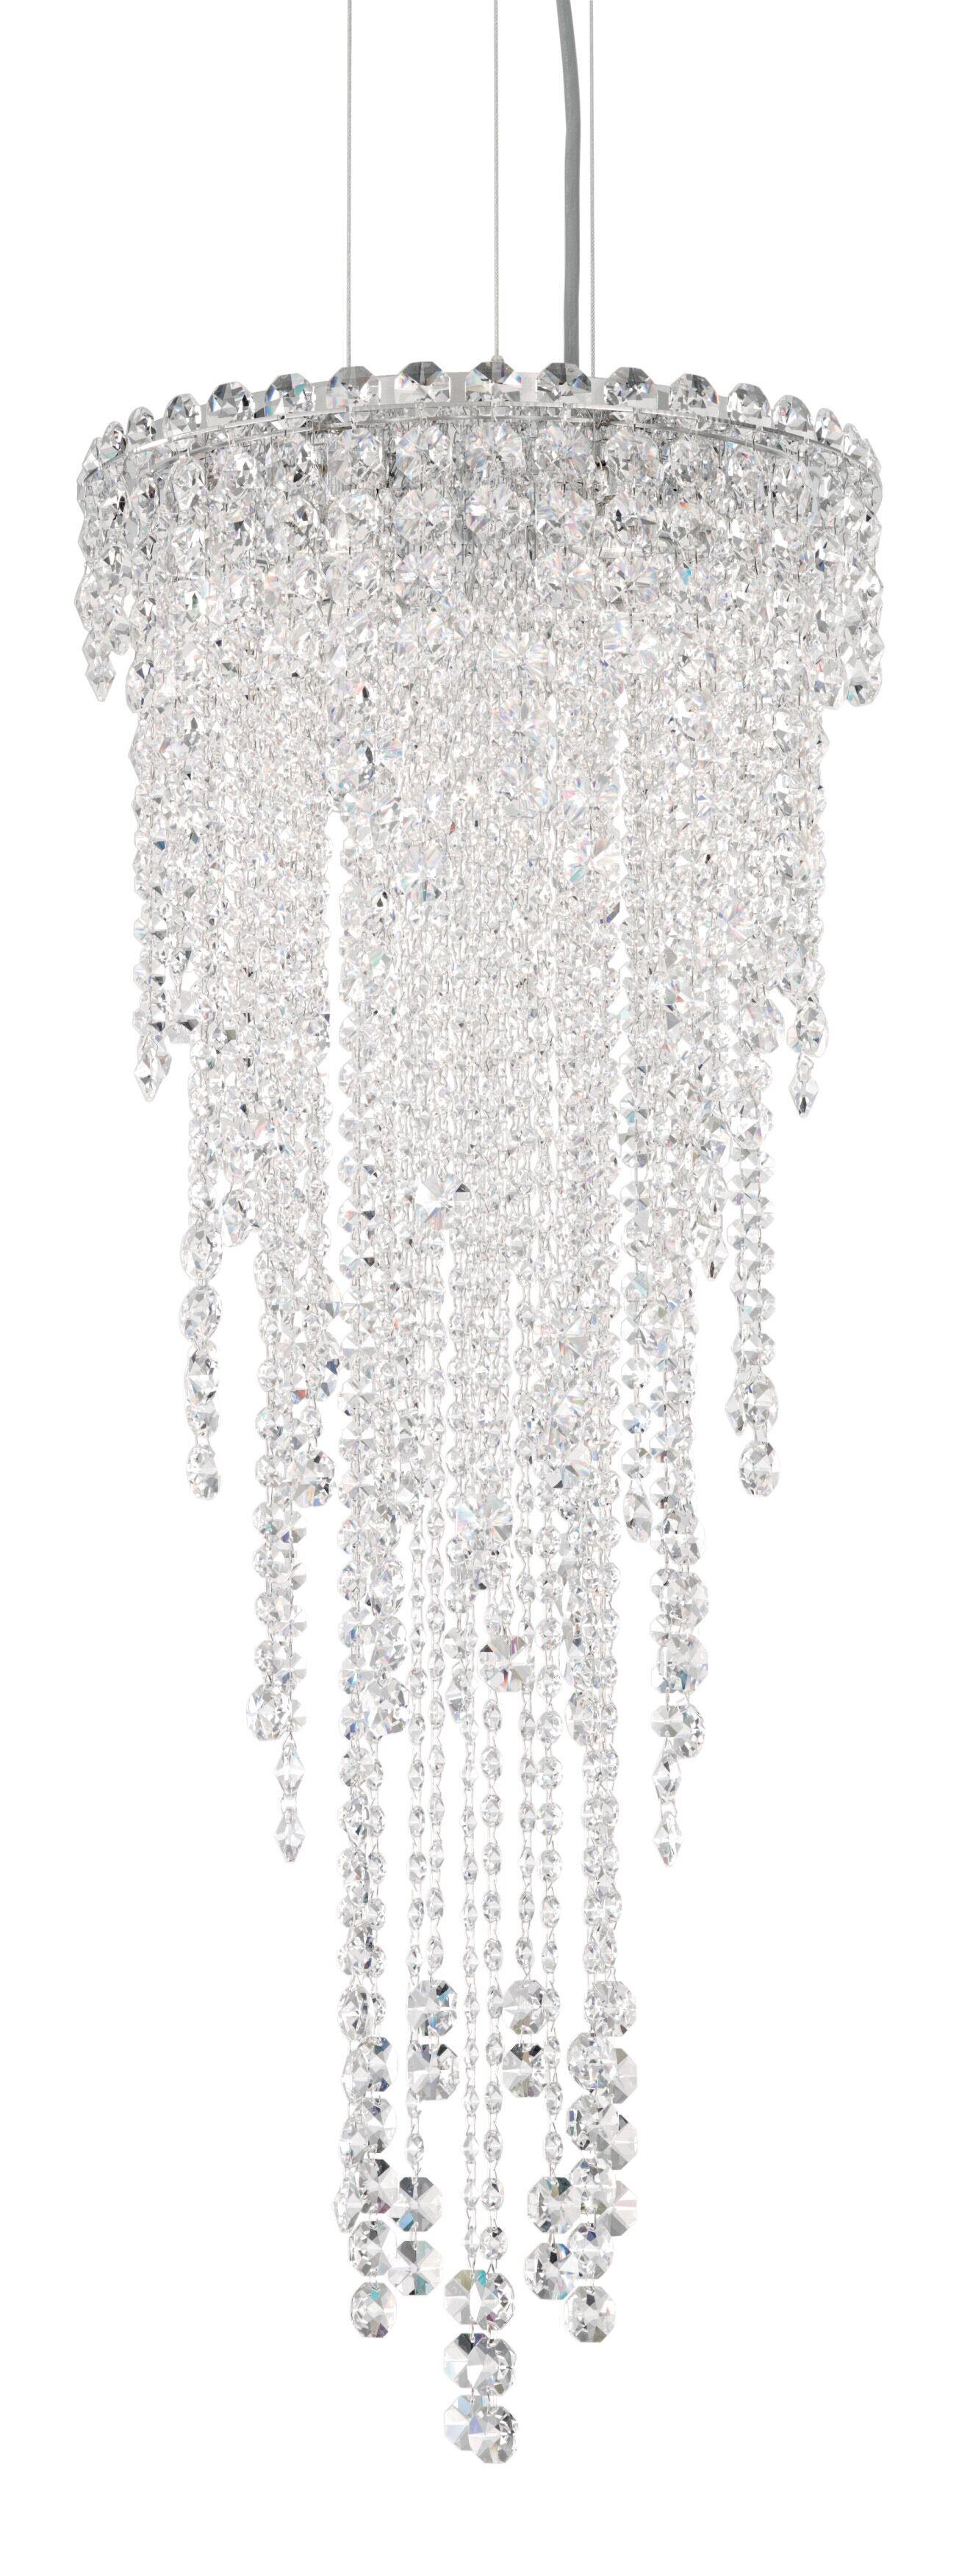 Chantant 4-Light Crystal Chandelier Crystal Grade: Heritage Handcut, Size: 35